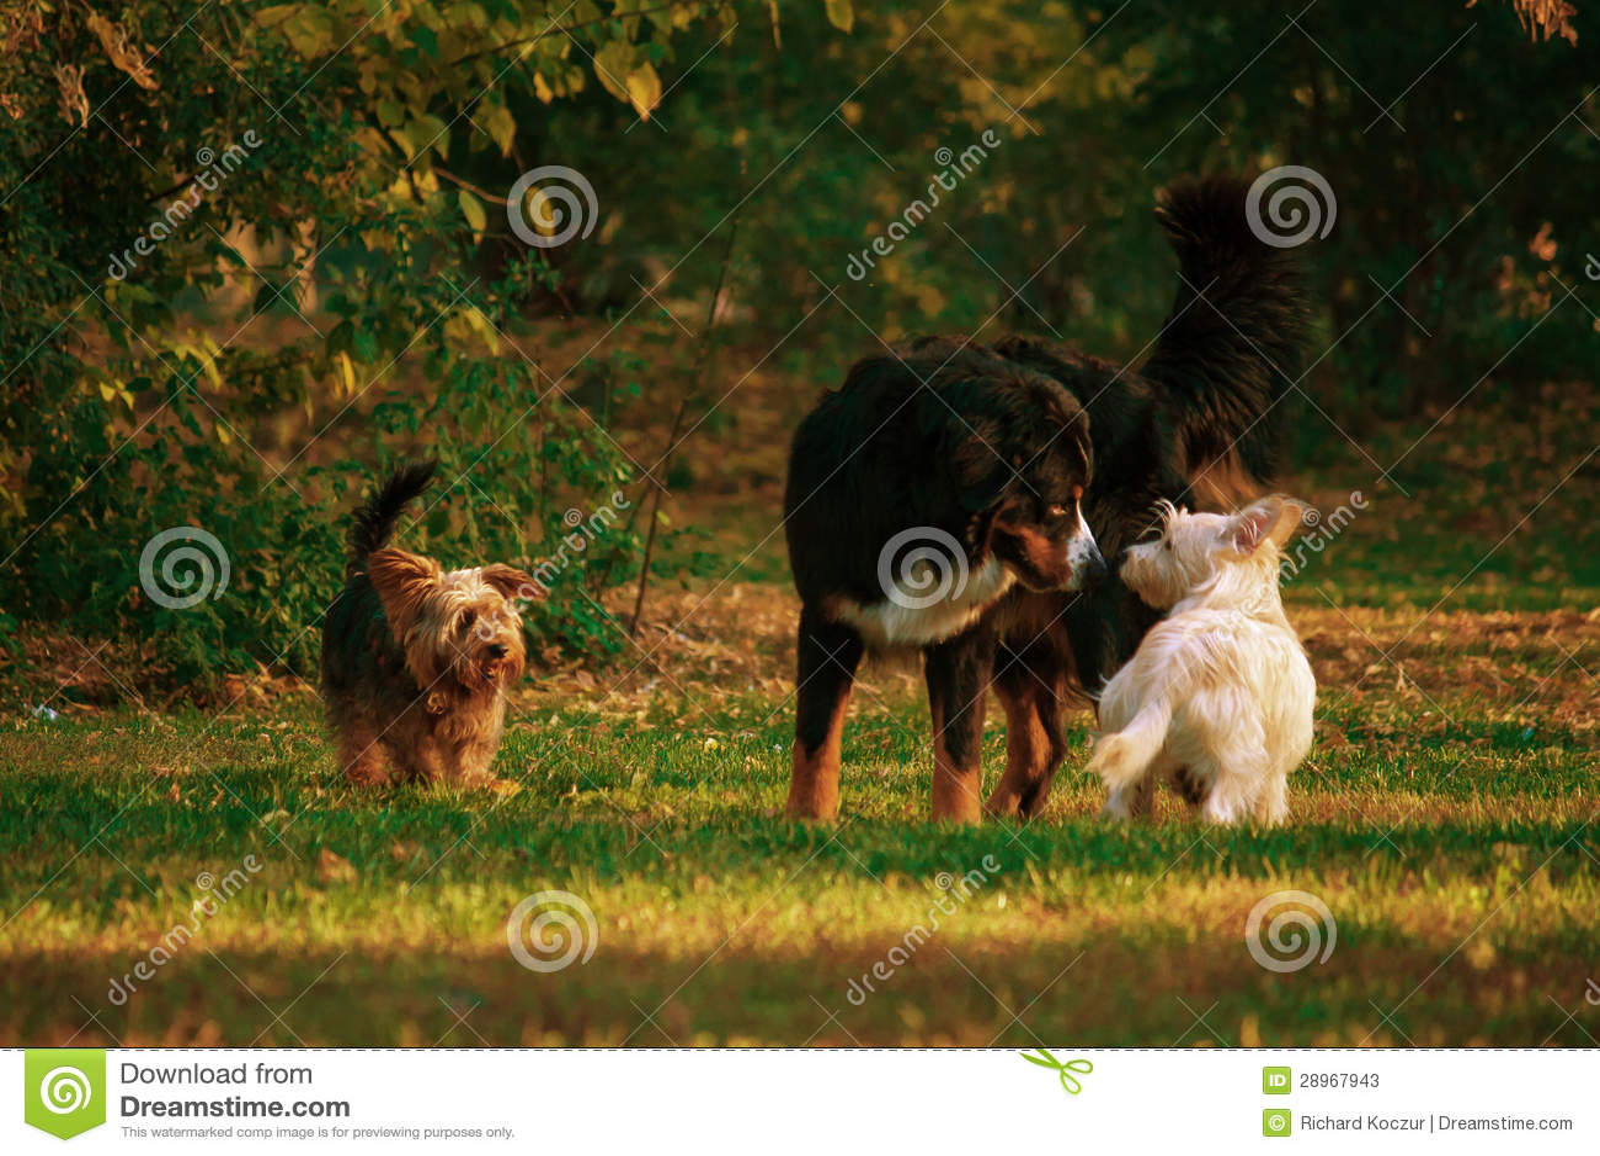 Hundesitzung